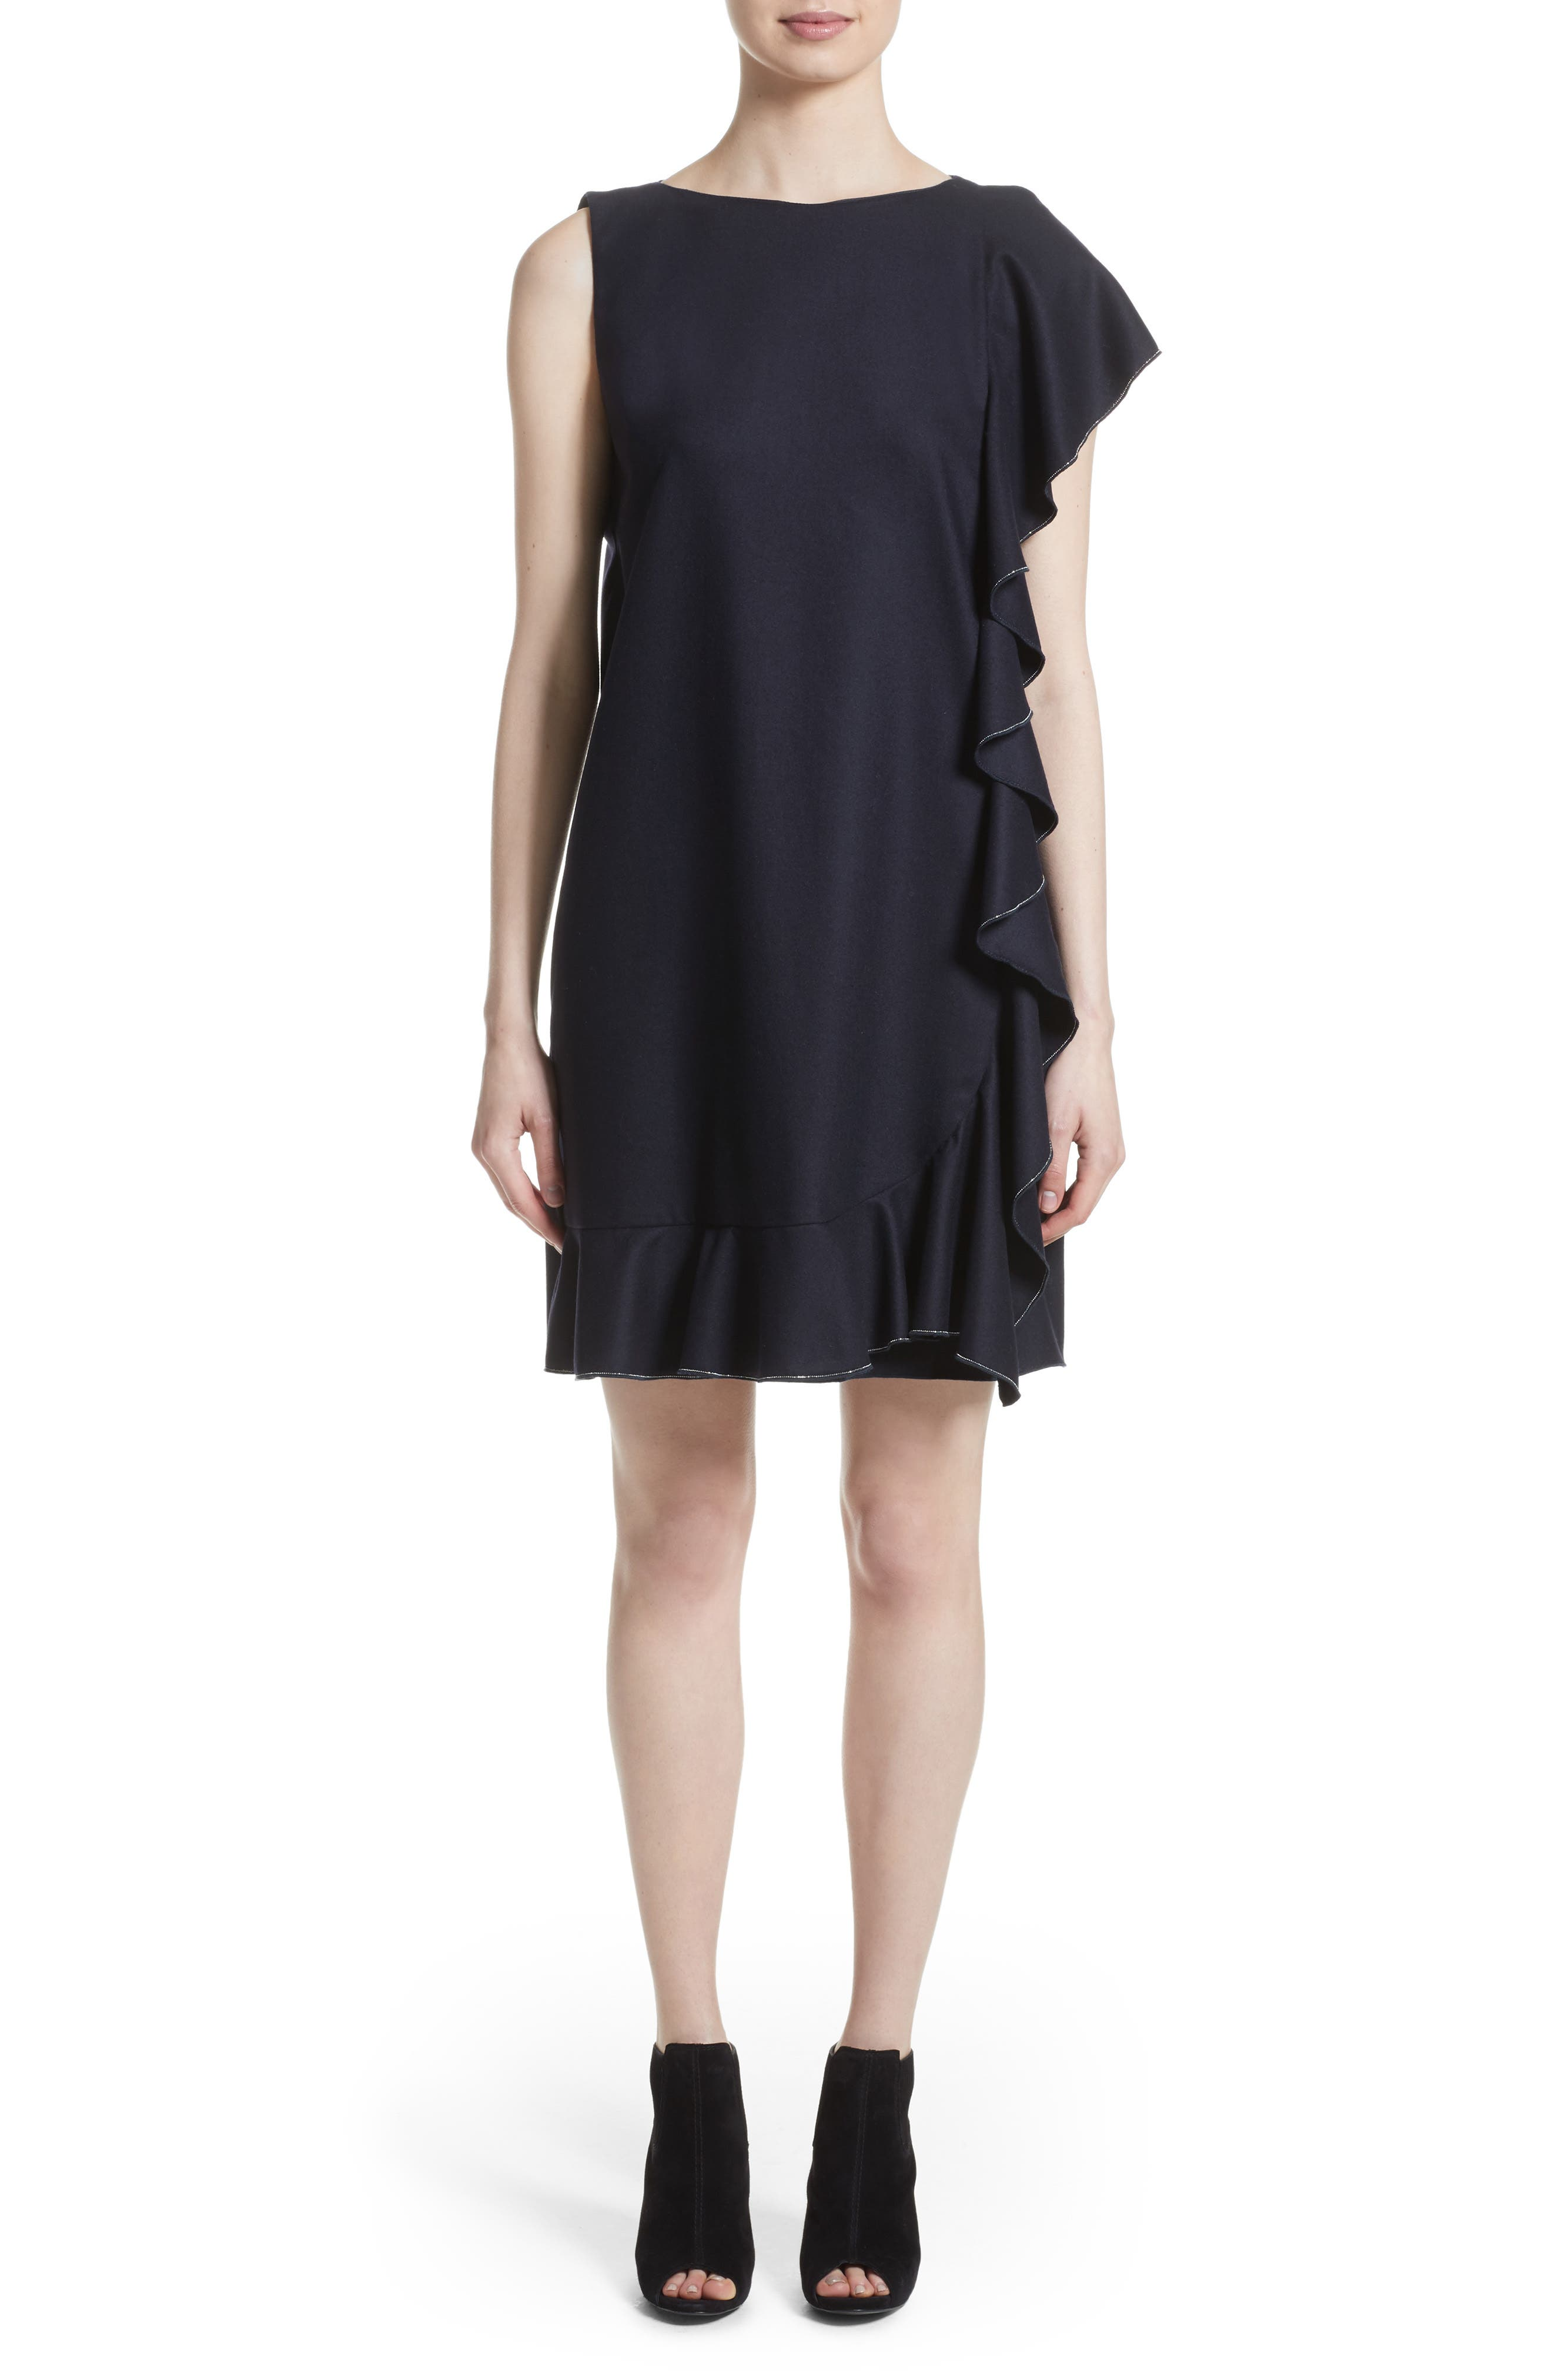 FABIANA FILIPPI Stretch Wool & Cashmere Ruffle Dress, Main, color, 400